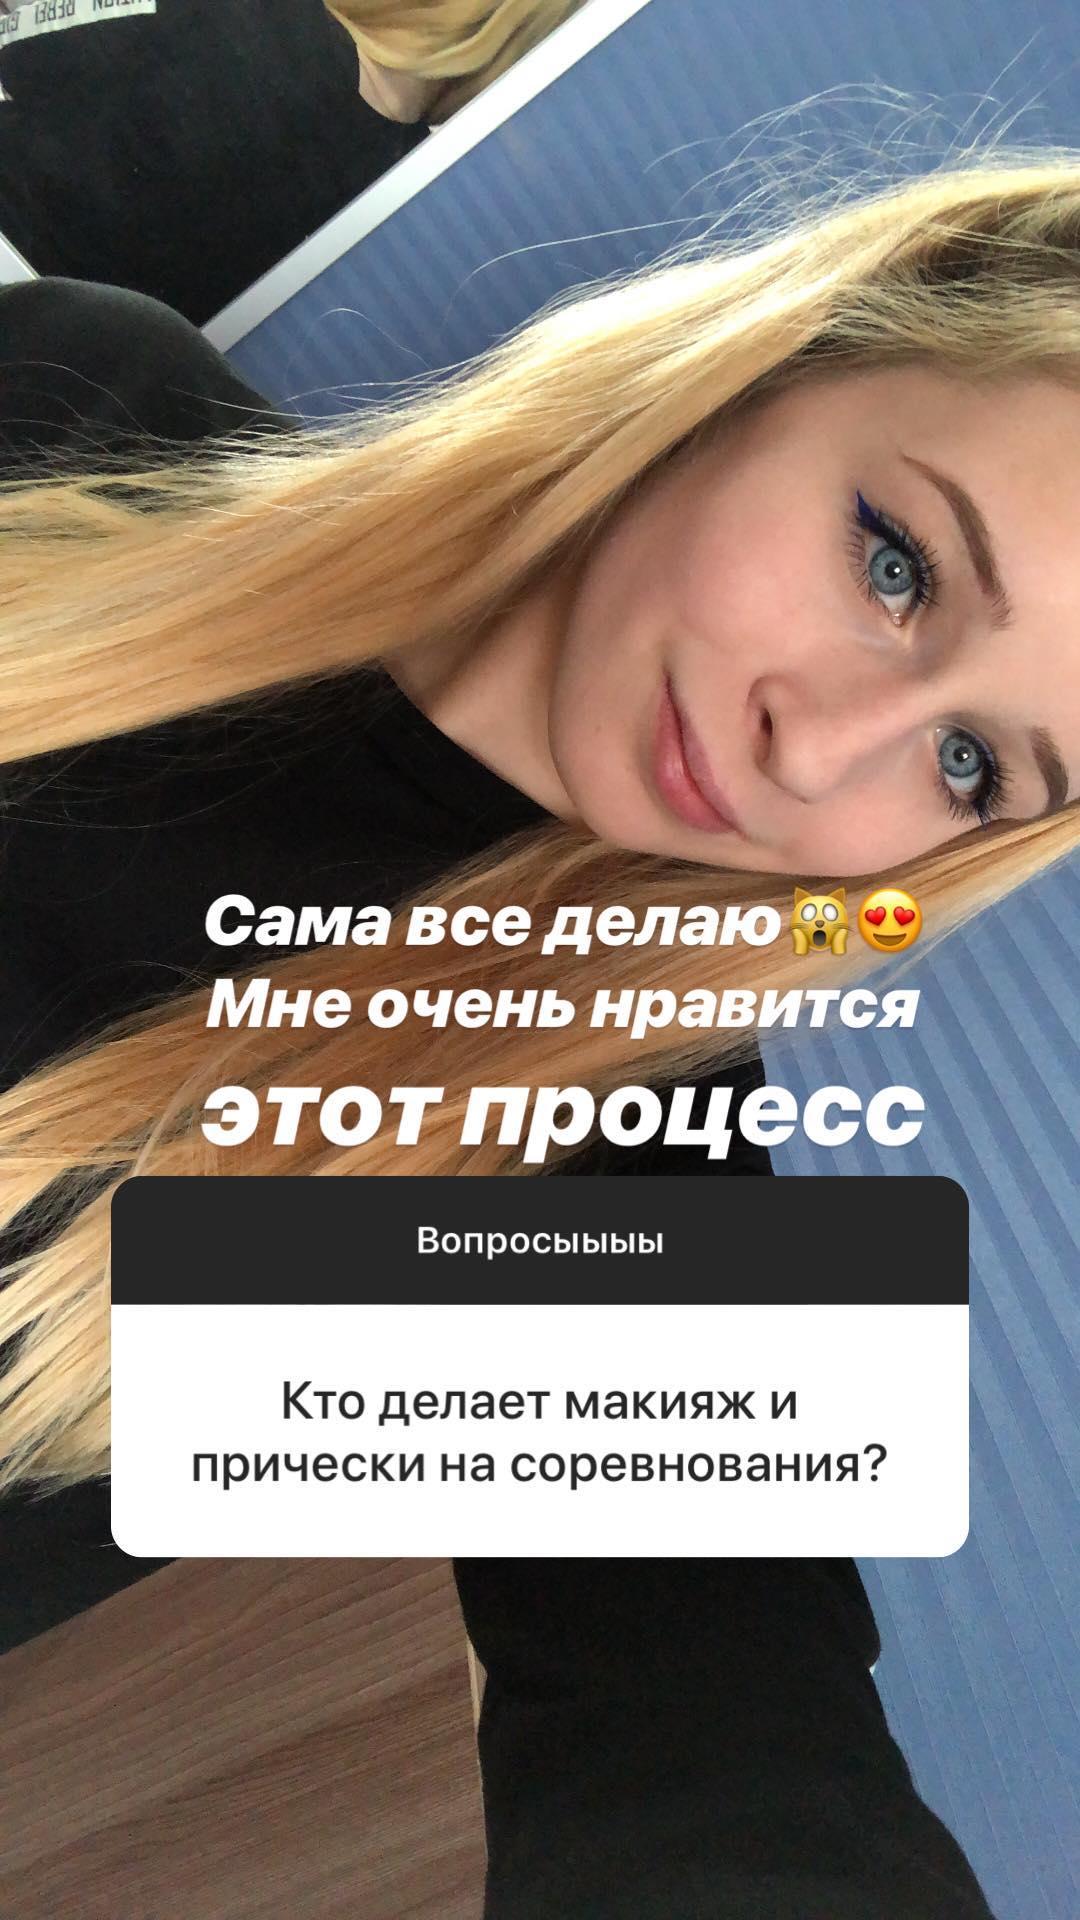 Дарья Паненкова - Страница 8 H1qhgCZzmVk